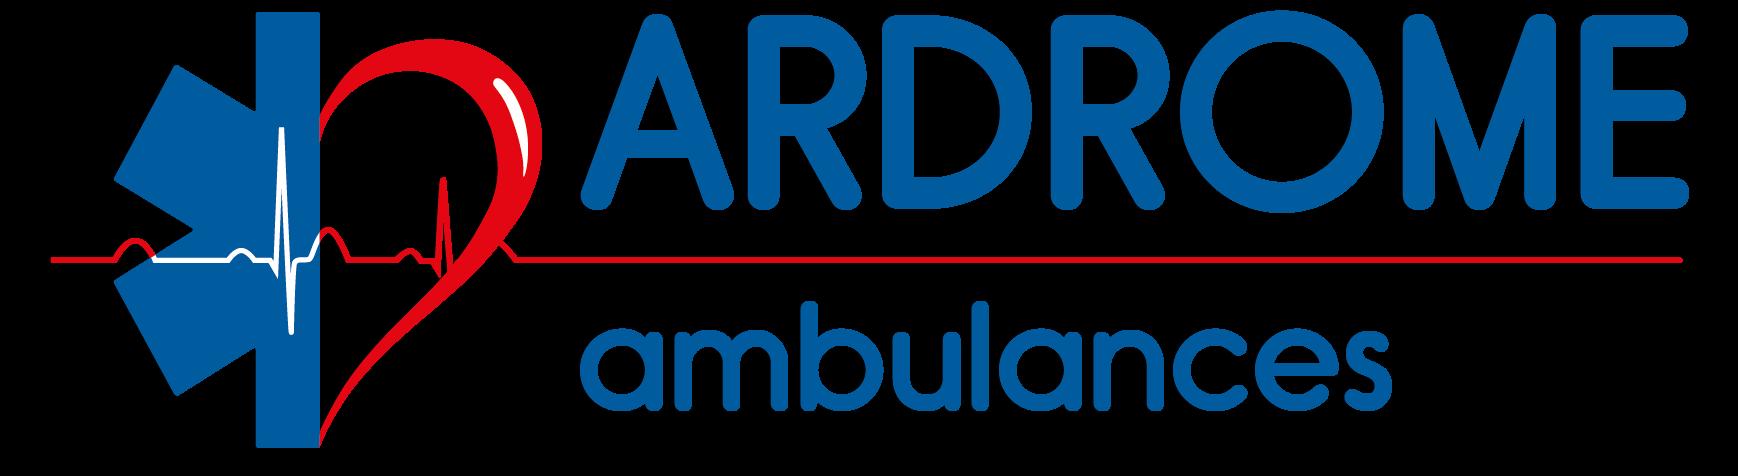 Ardrome Ambulances